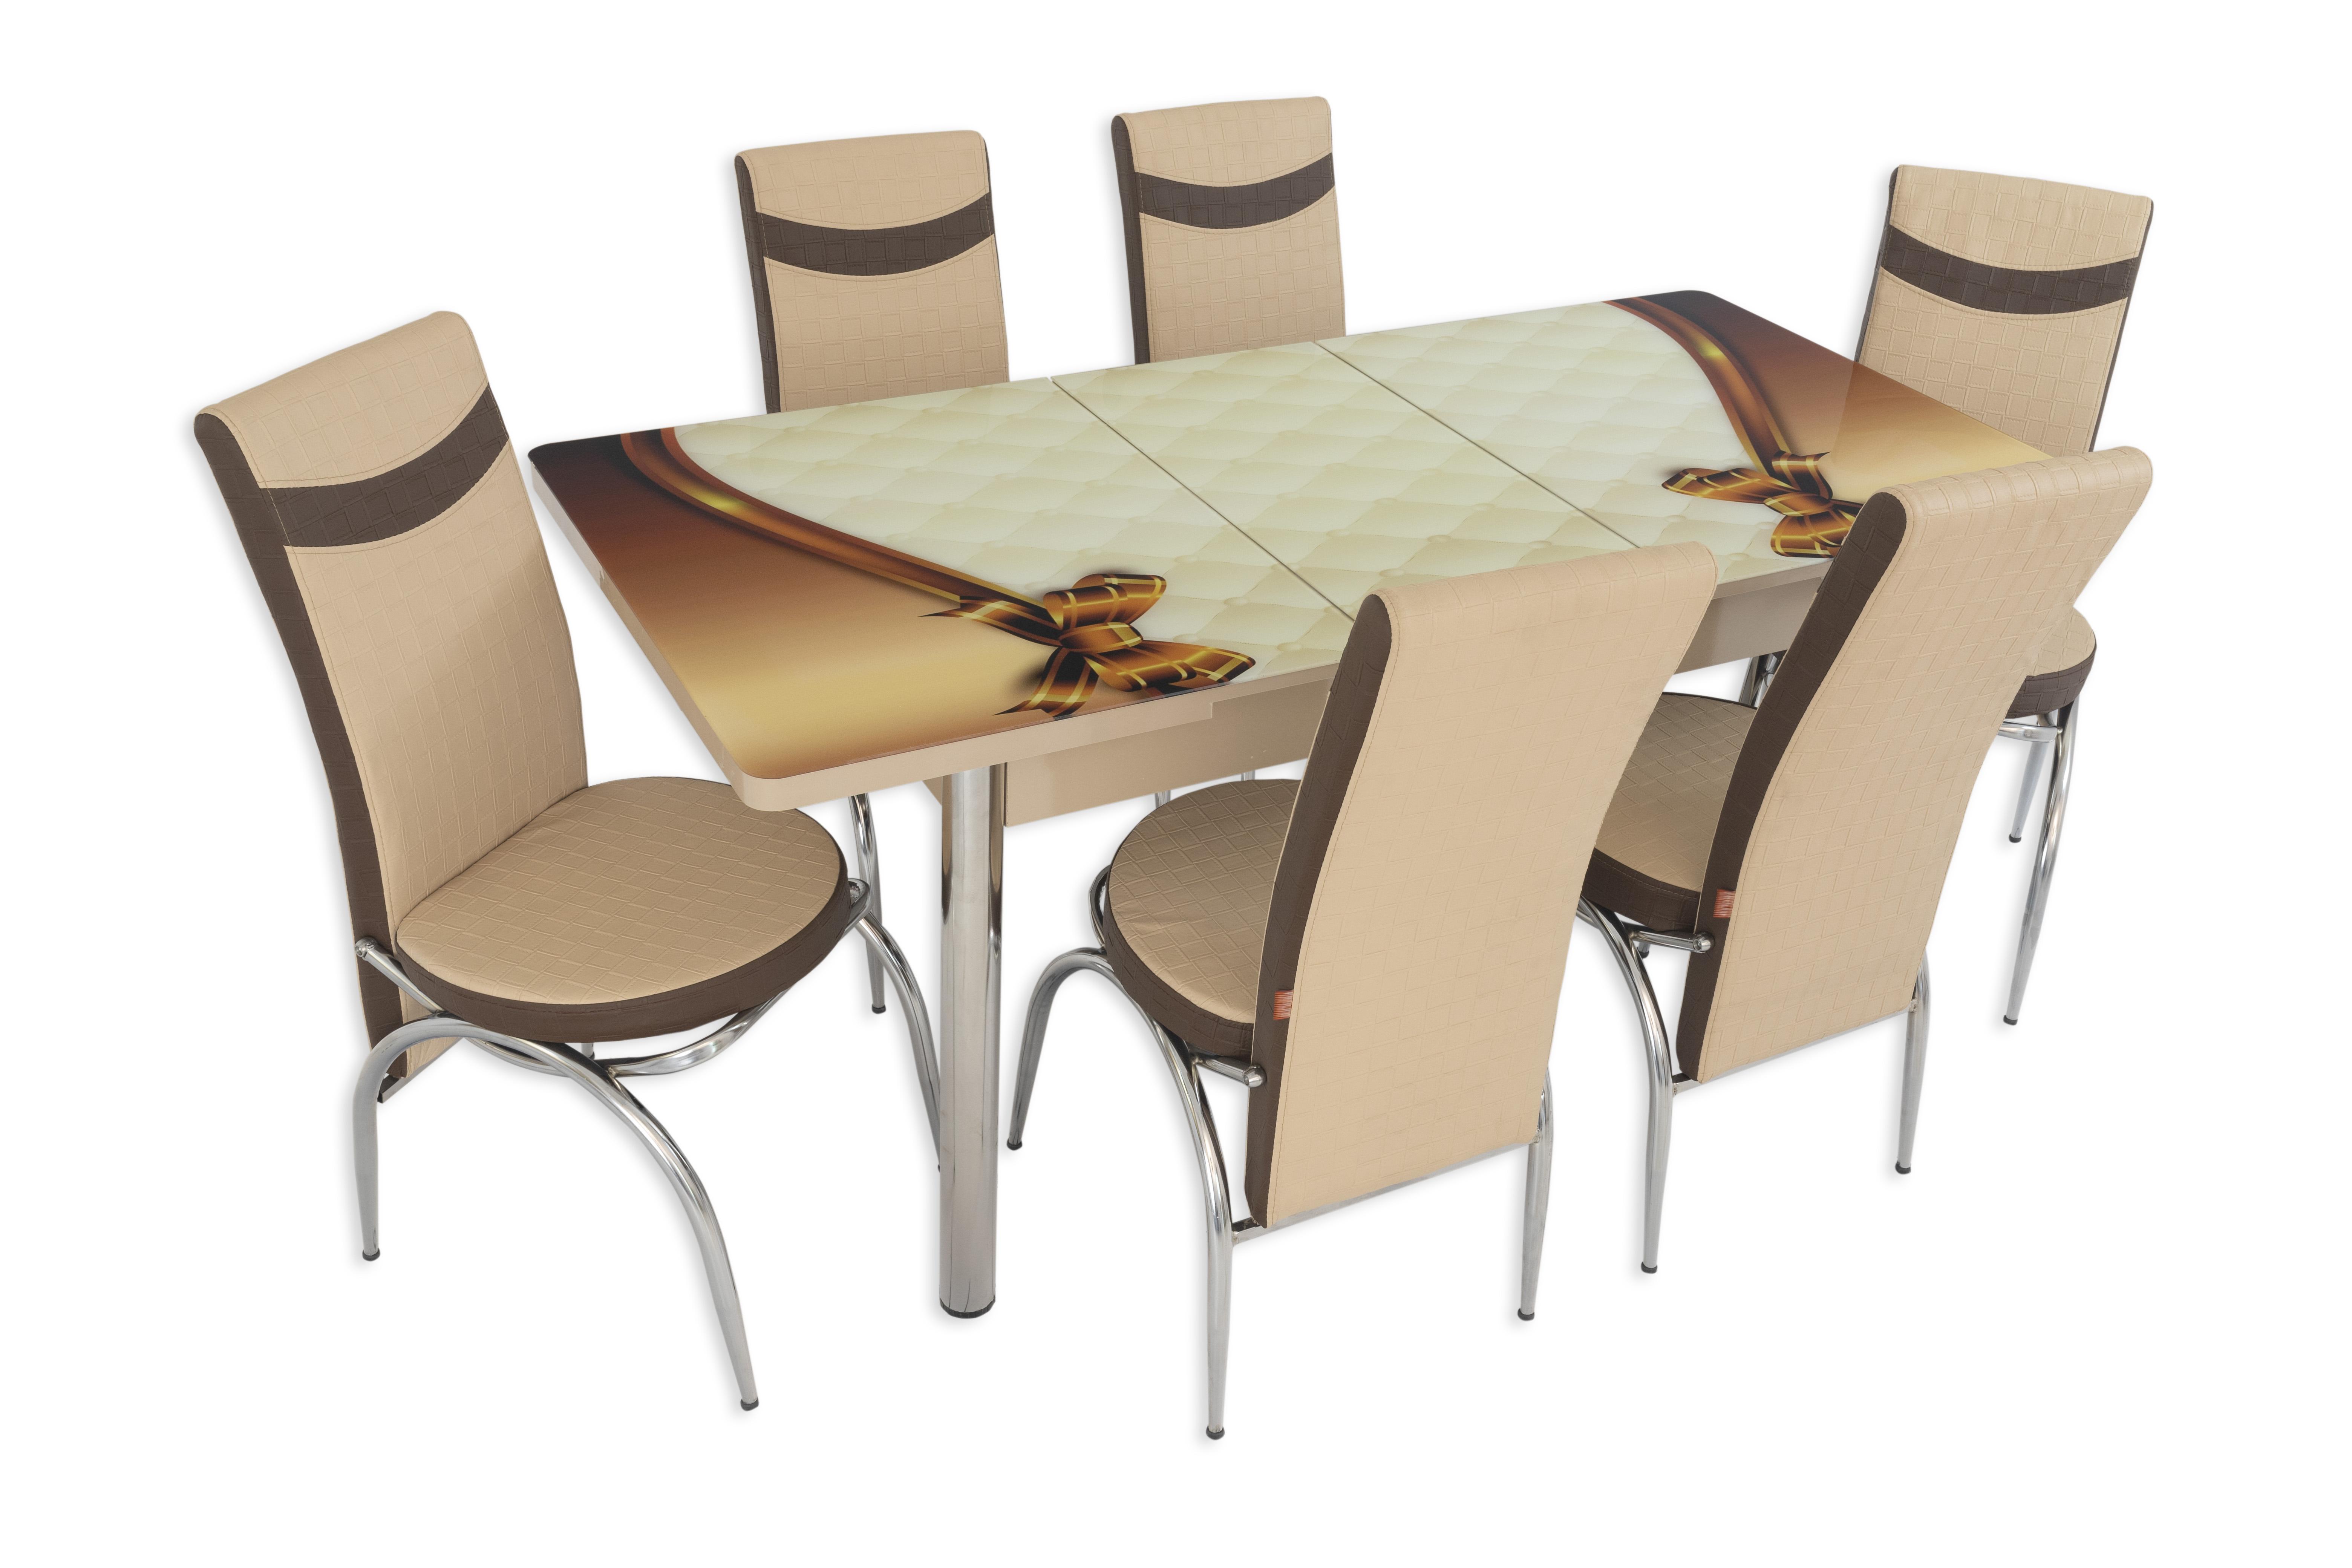 Set masa extensibila cu 6 scaune ARTA Table Queen, PAL melaminat + piele ecologica, crem +maro, 169 x 80 cm imagine 2021 mathaus